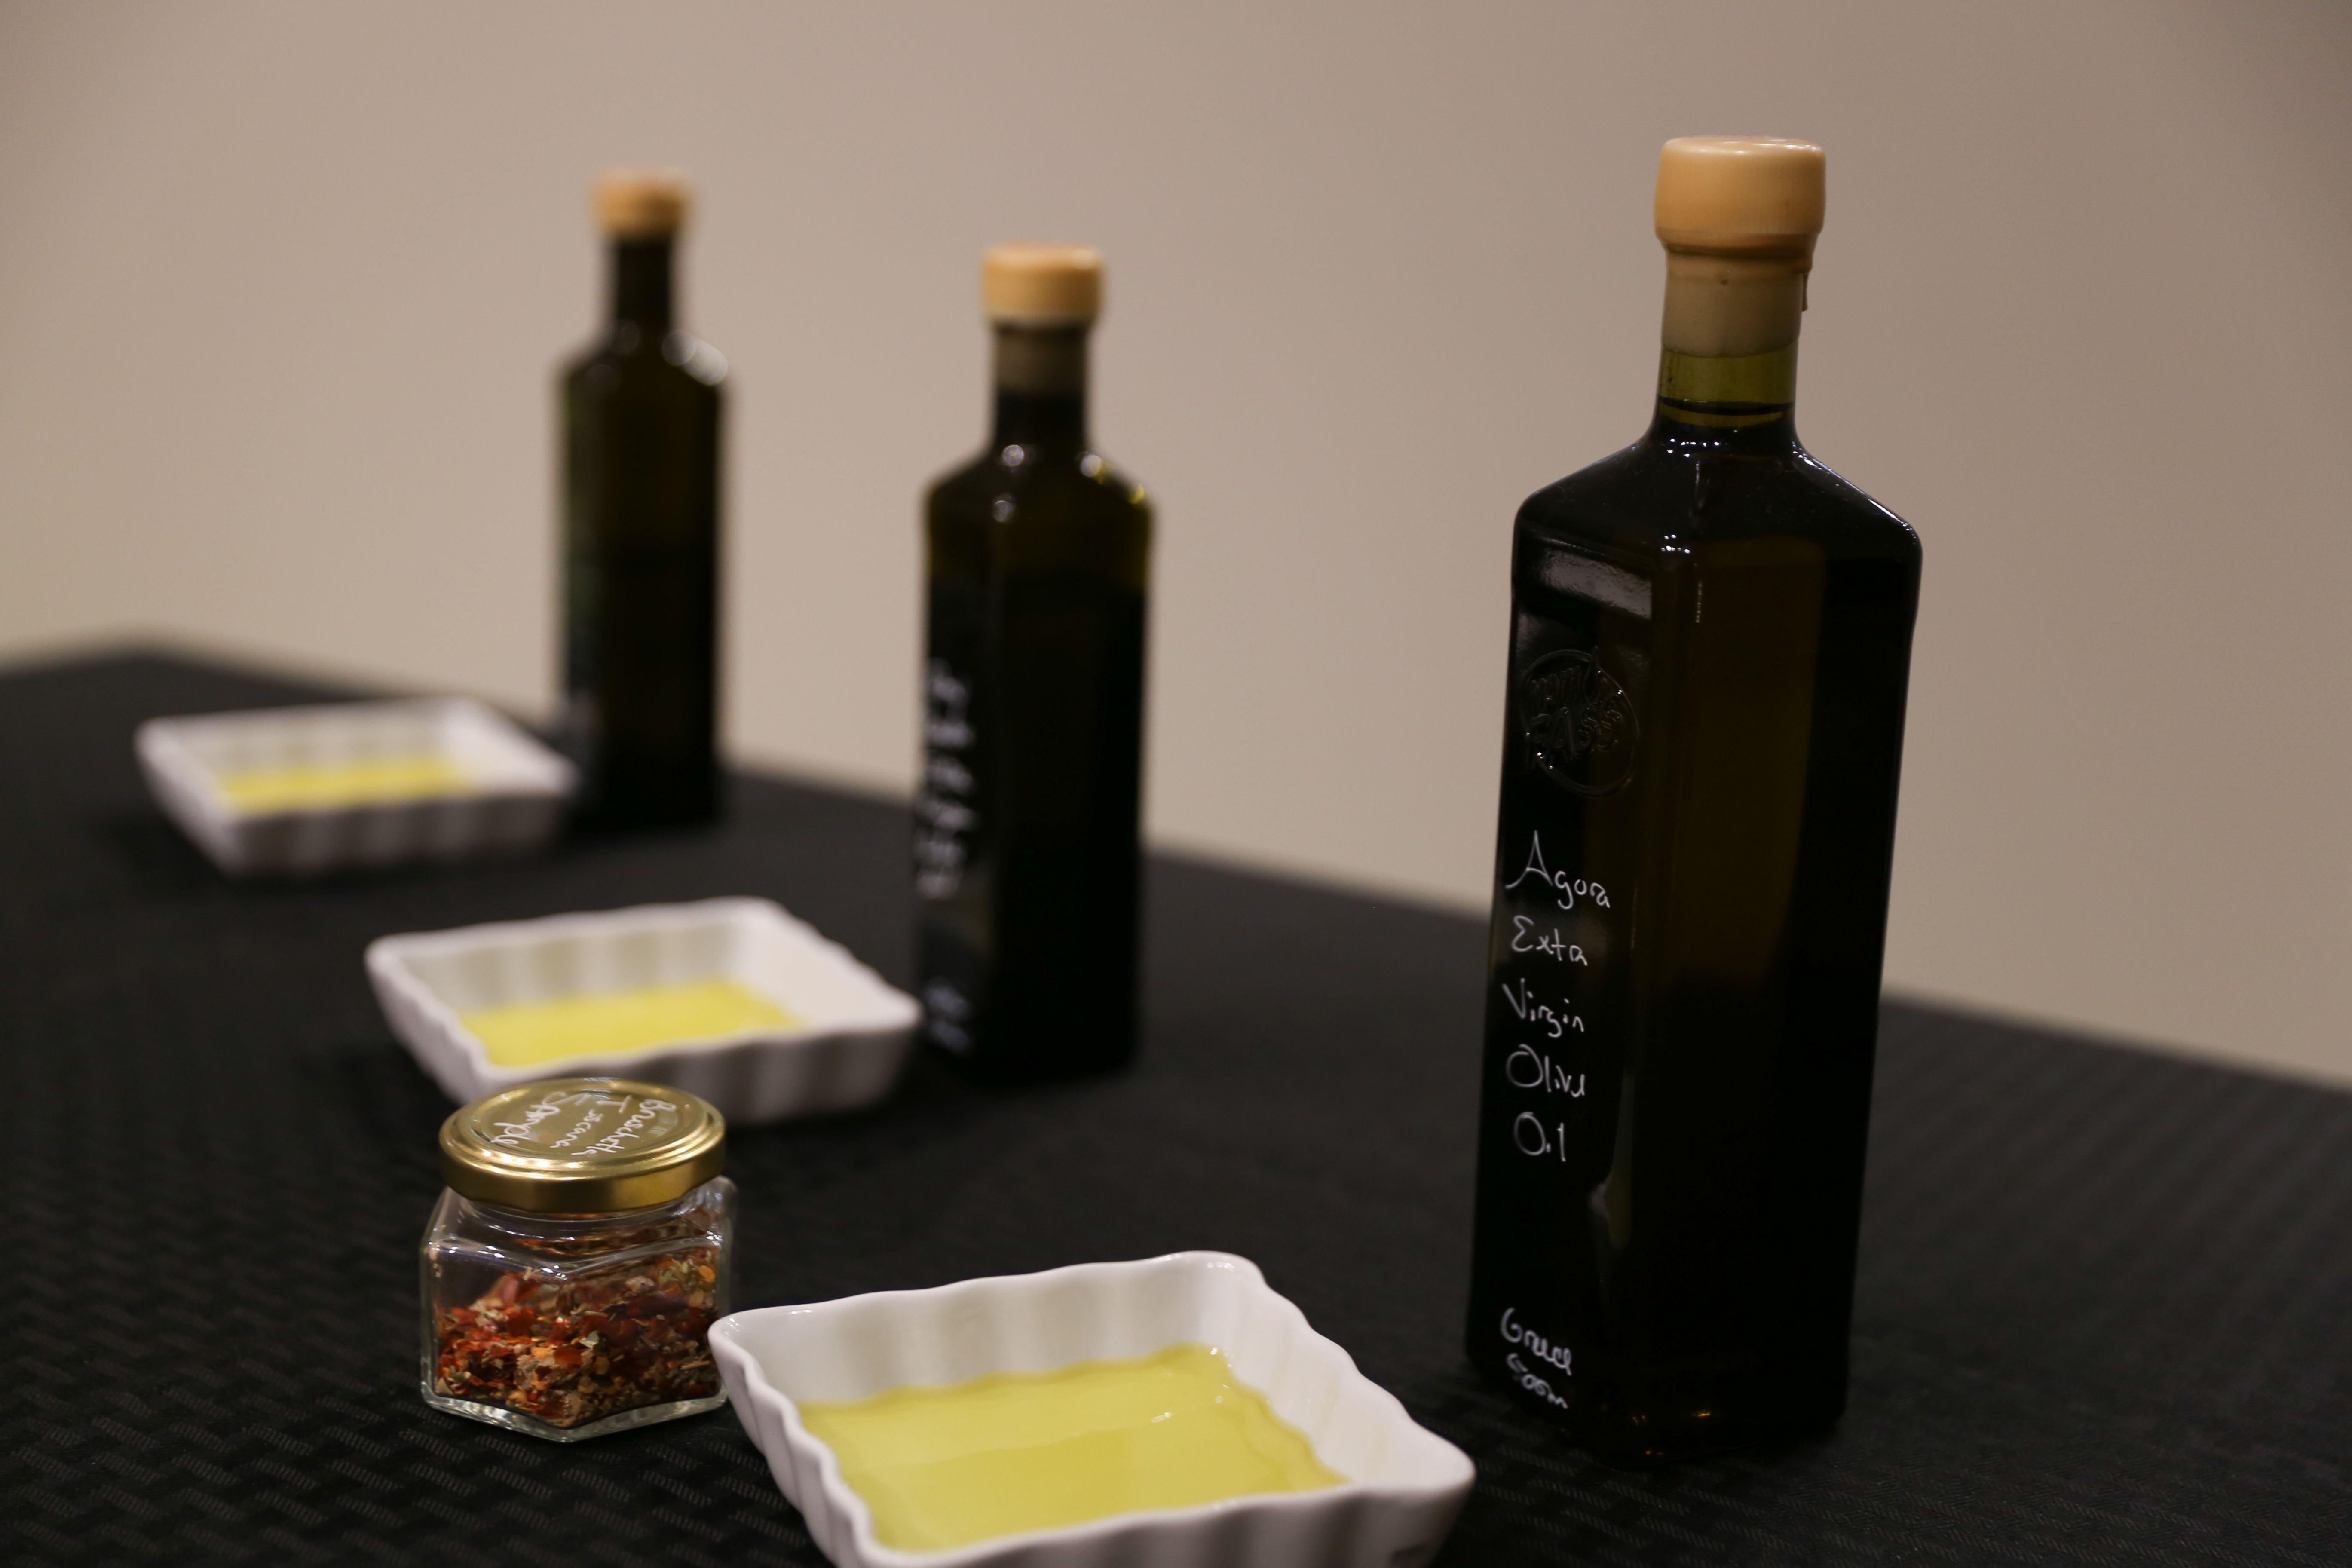 Vom Fass Olive Oil Tasting Minneapolis Food Mall Of America Fine Restaurant